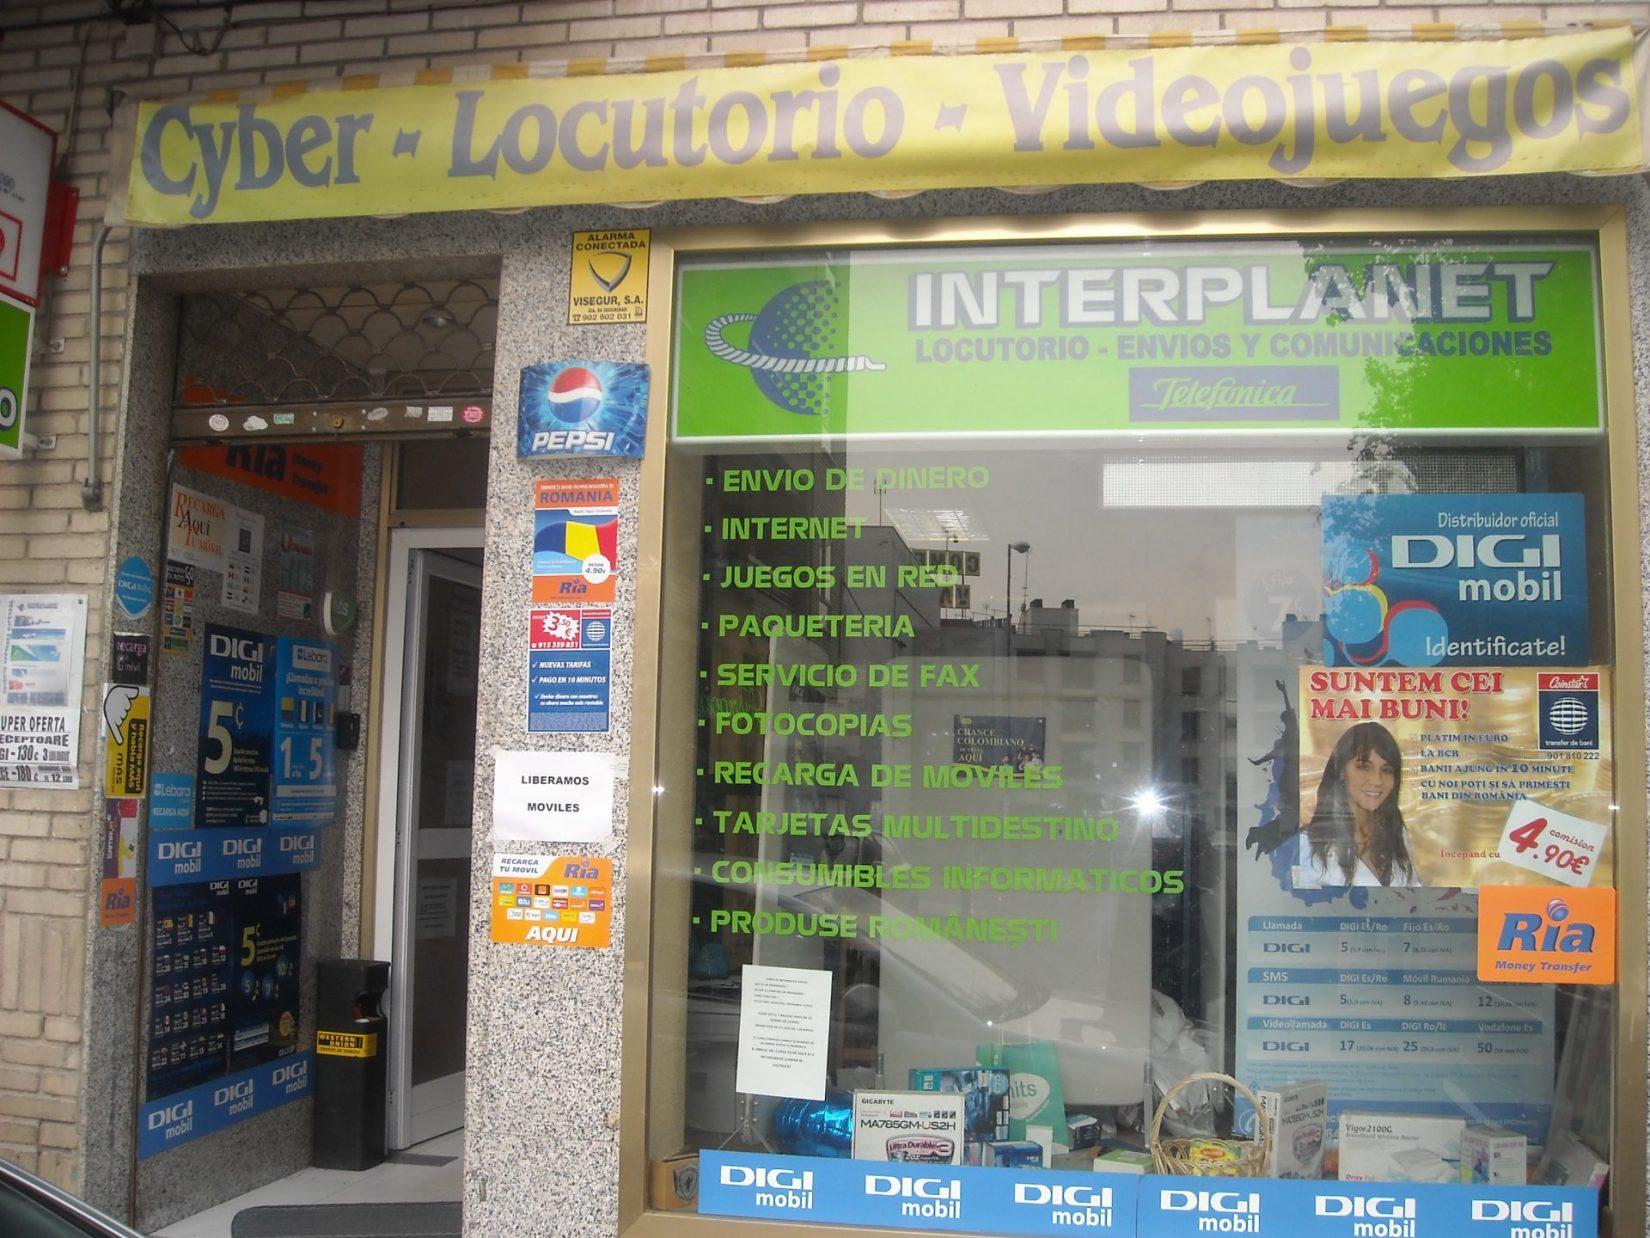 CYBERLOCUTORIO INTERPLANET